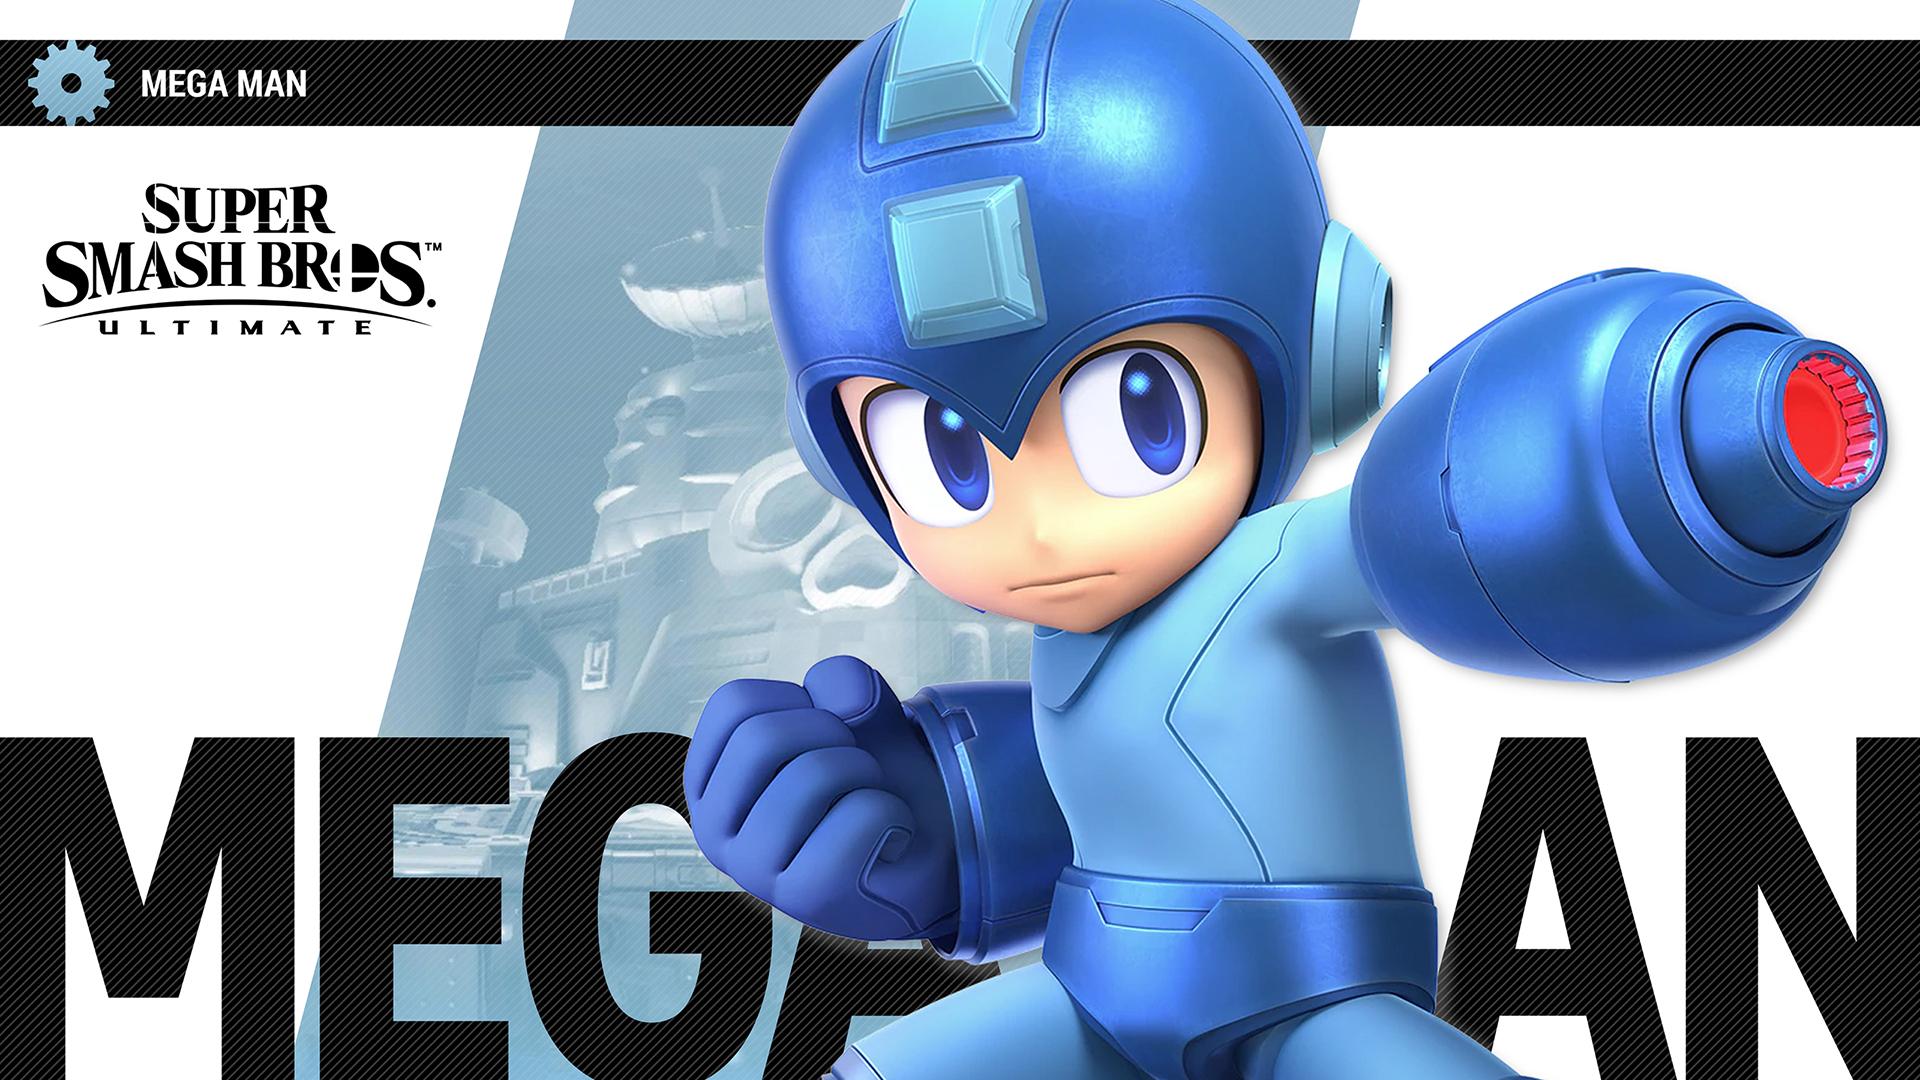 Super Smash Bros Ultimate Mega Man Wallpapers Cat With